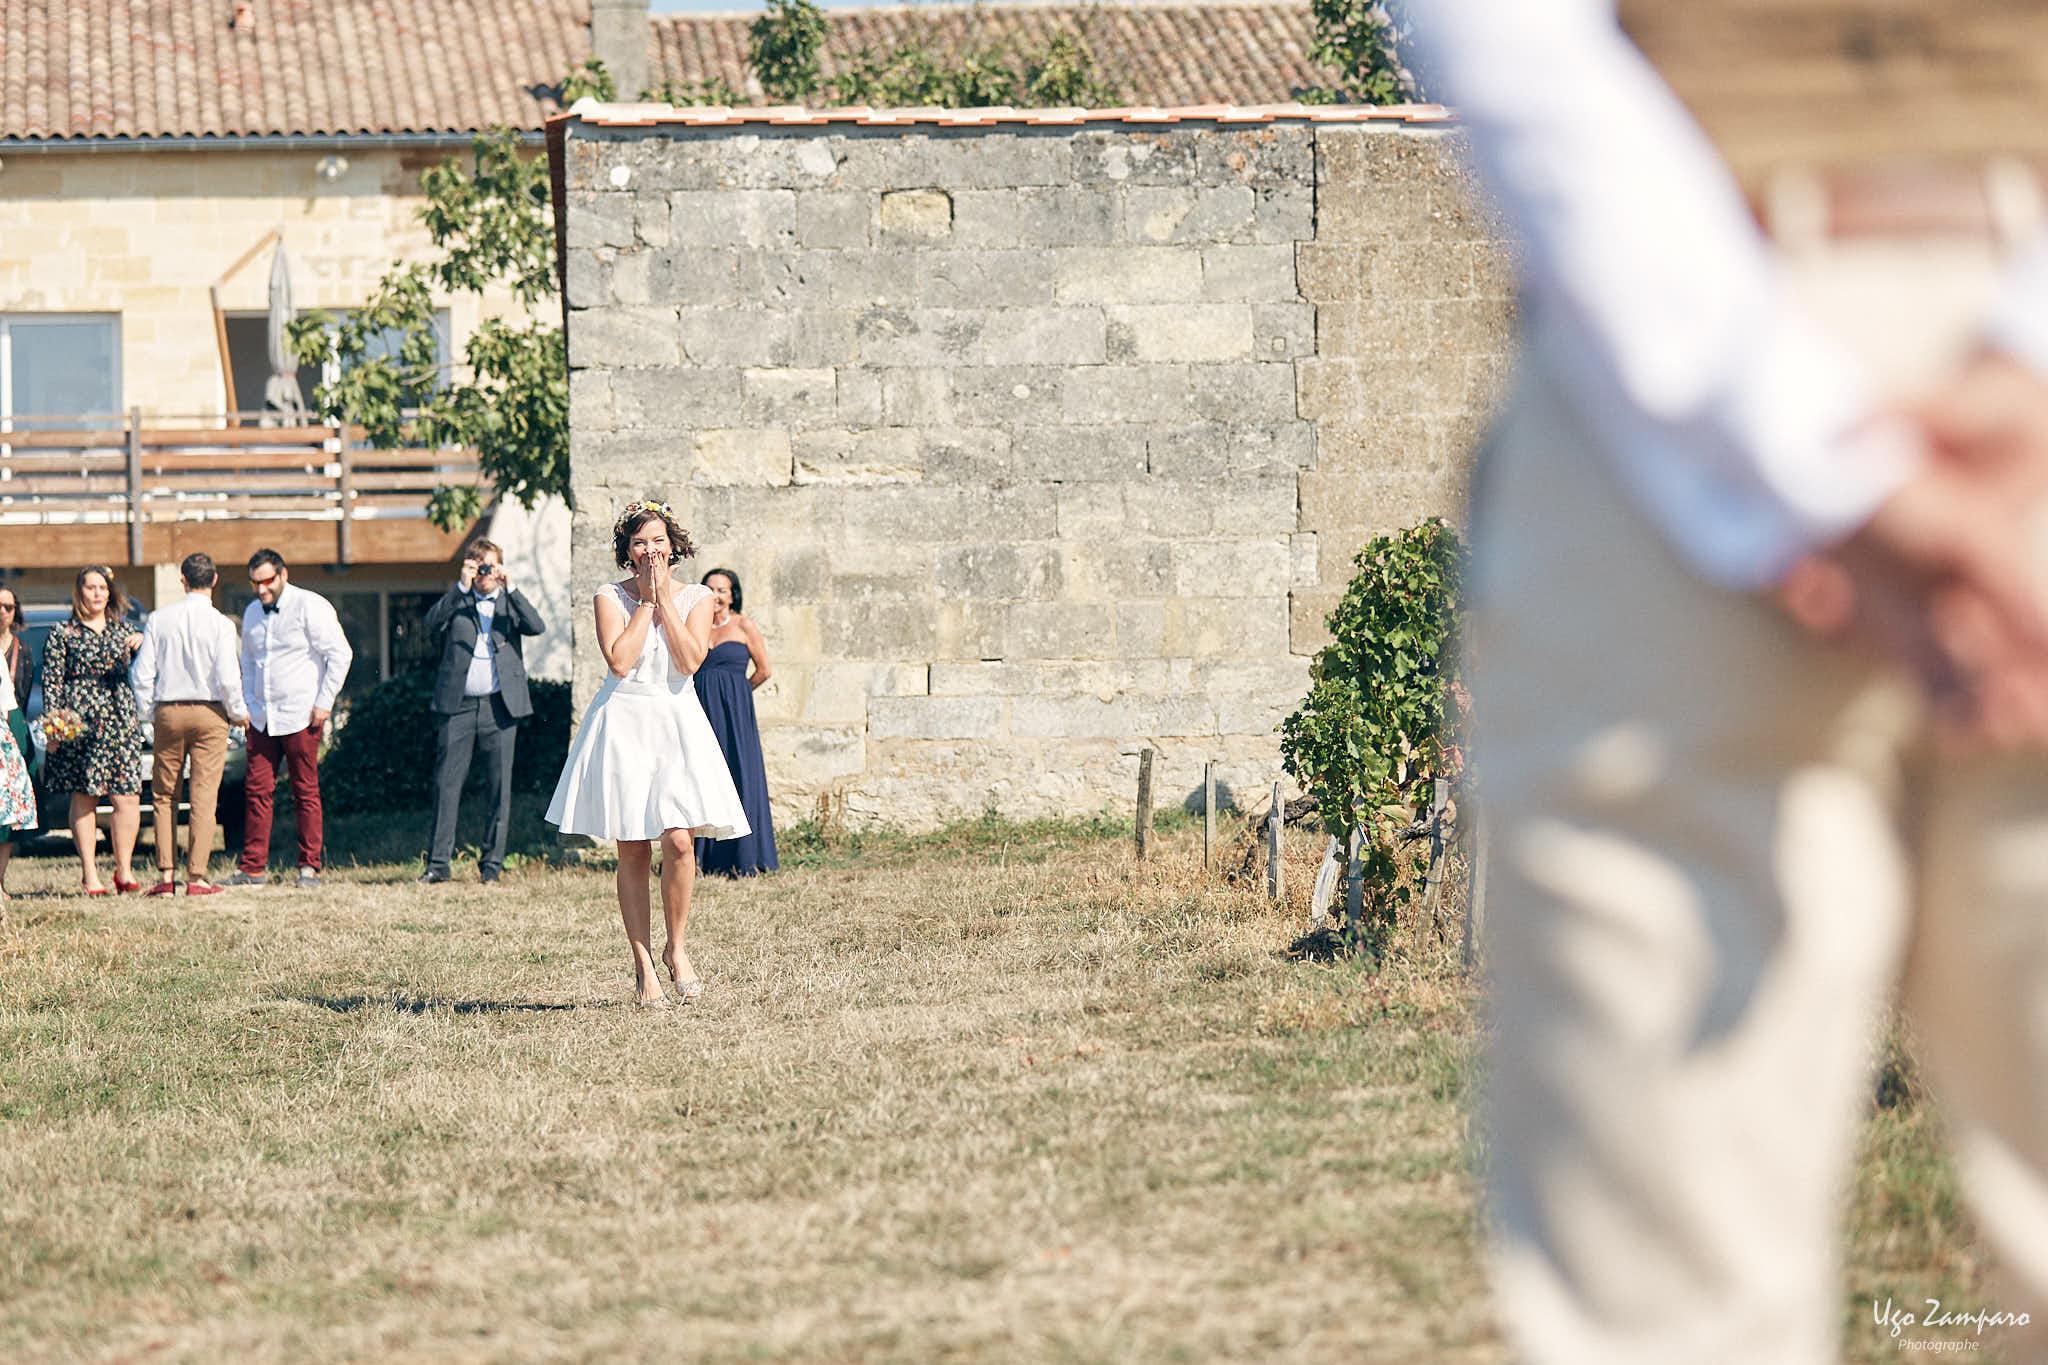 Le first-look des mariés !